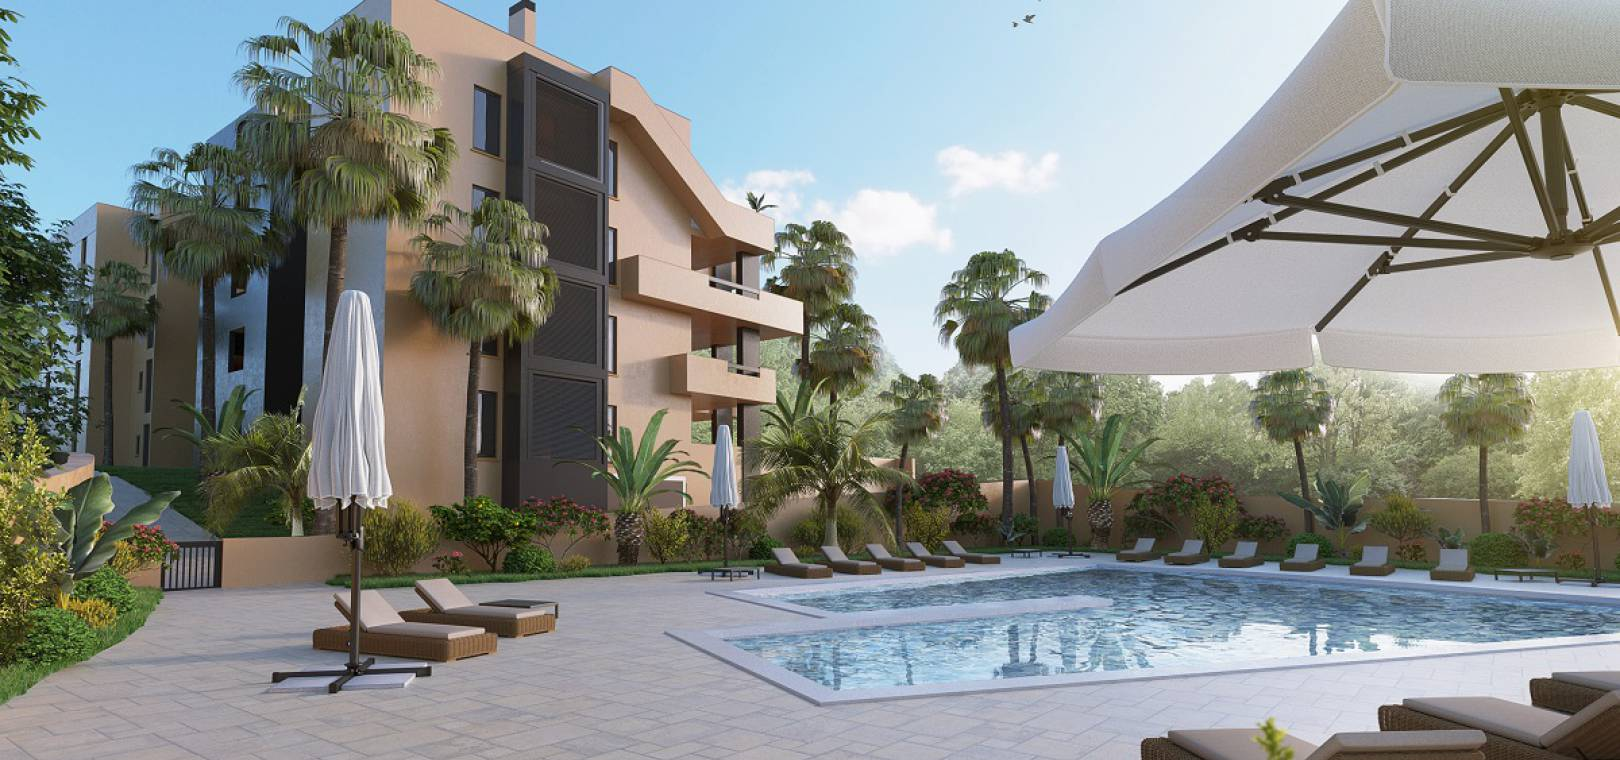 Palapa_Golf_Villamartin_New_Build_Properties_For_Sale_13